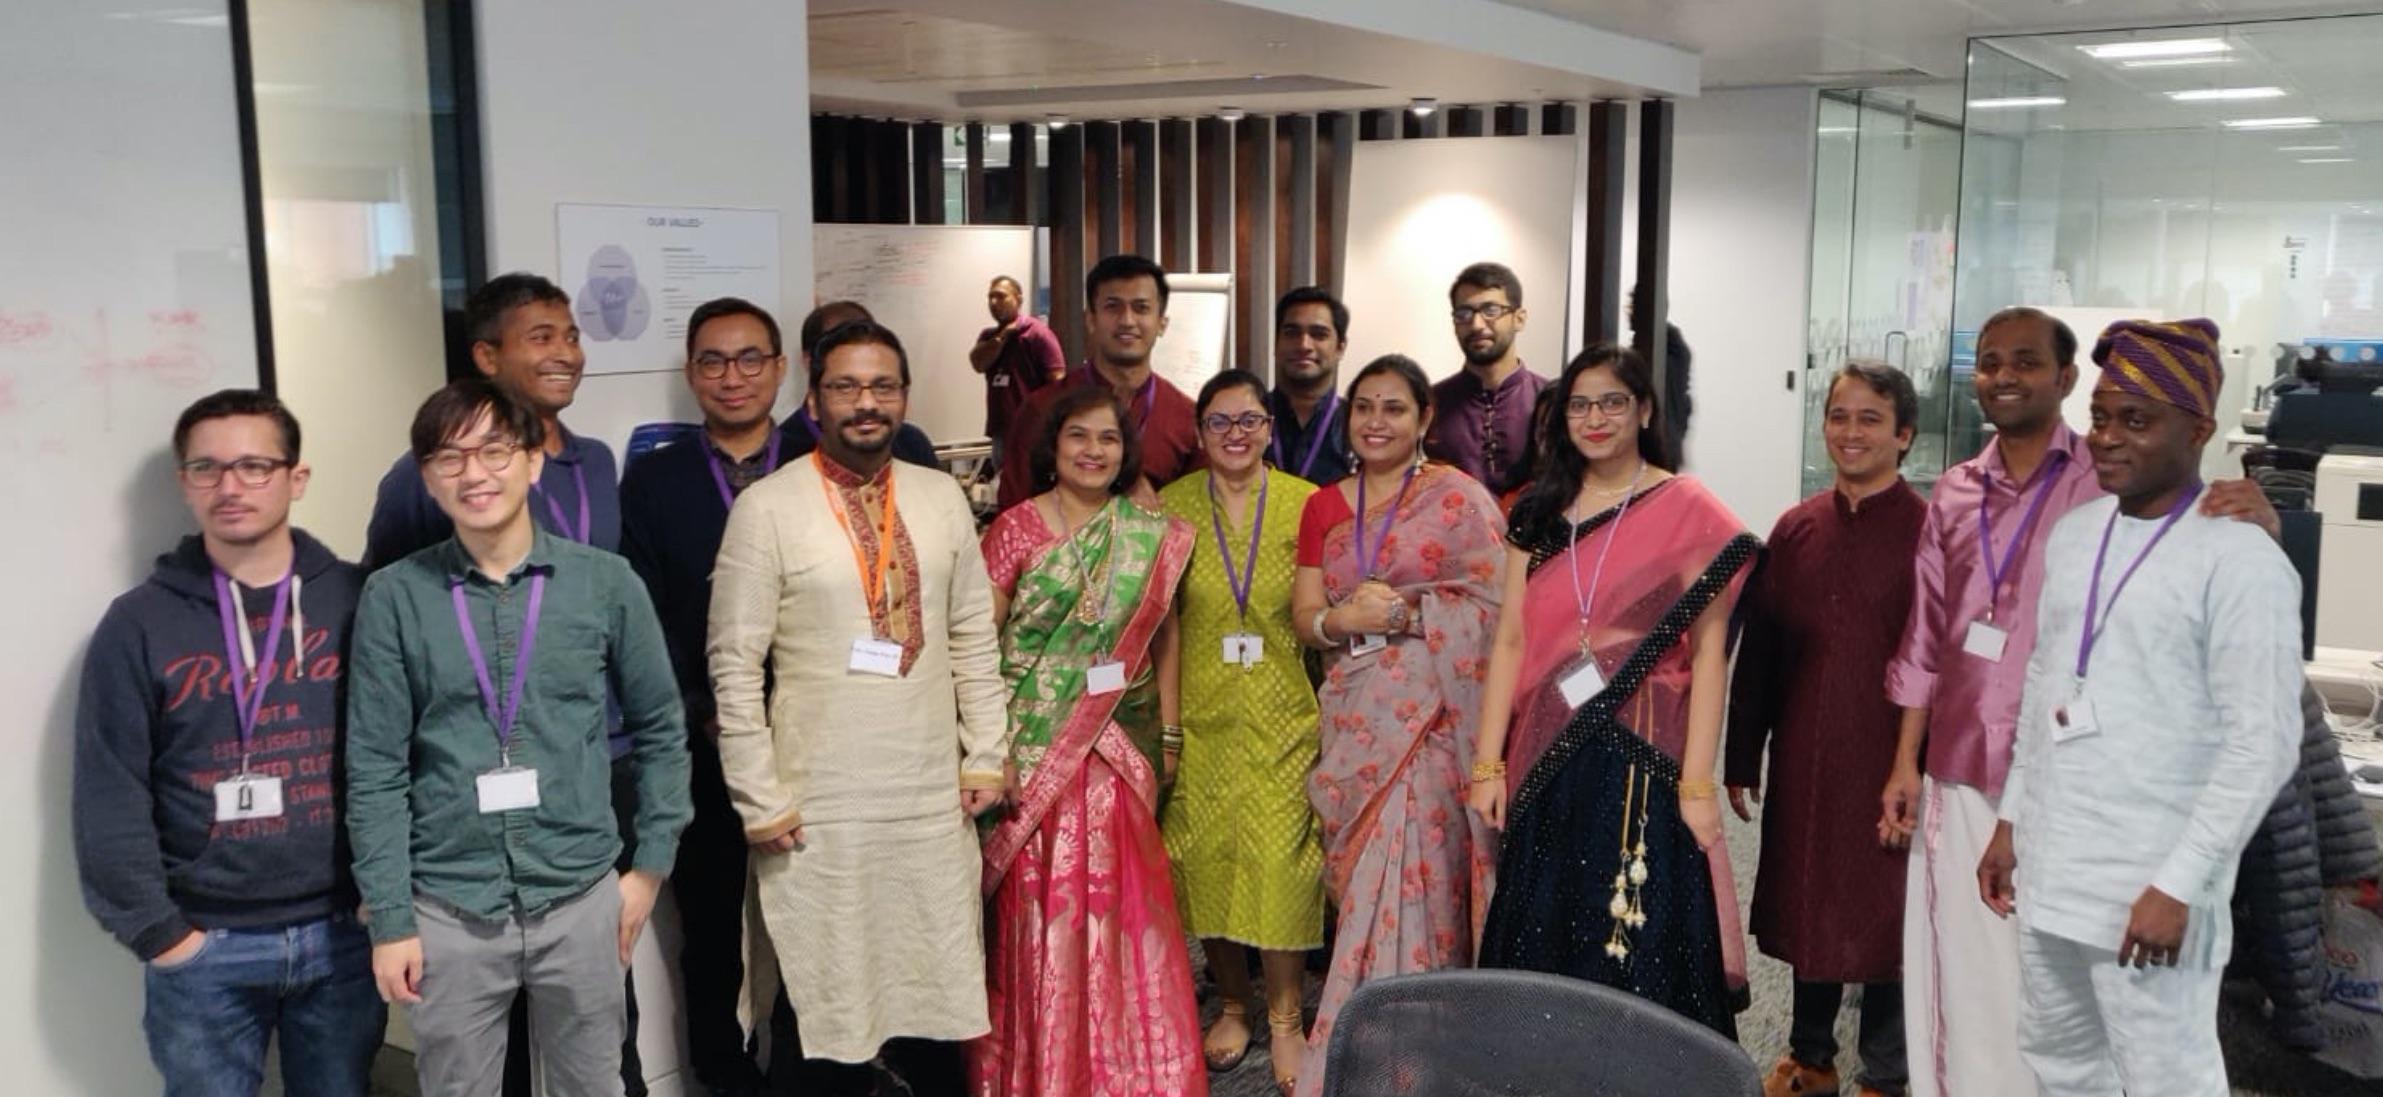 Celebrating Diwali 2019